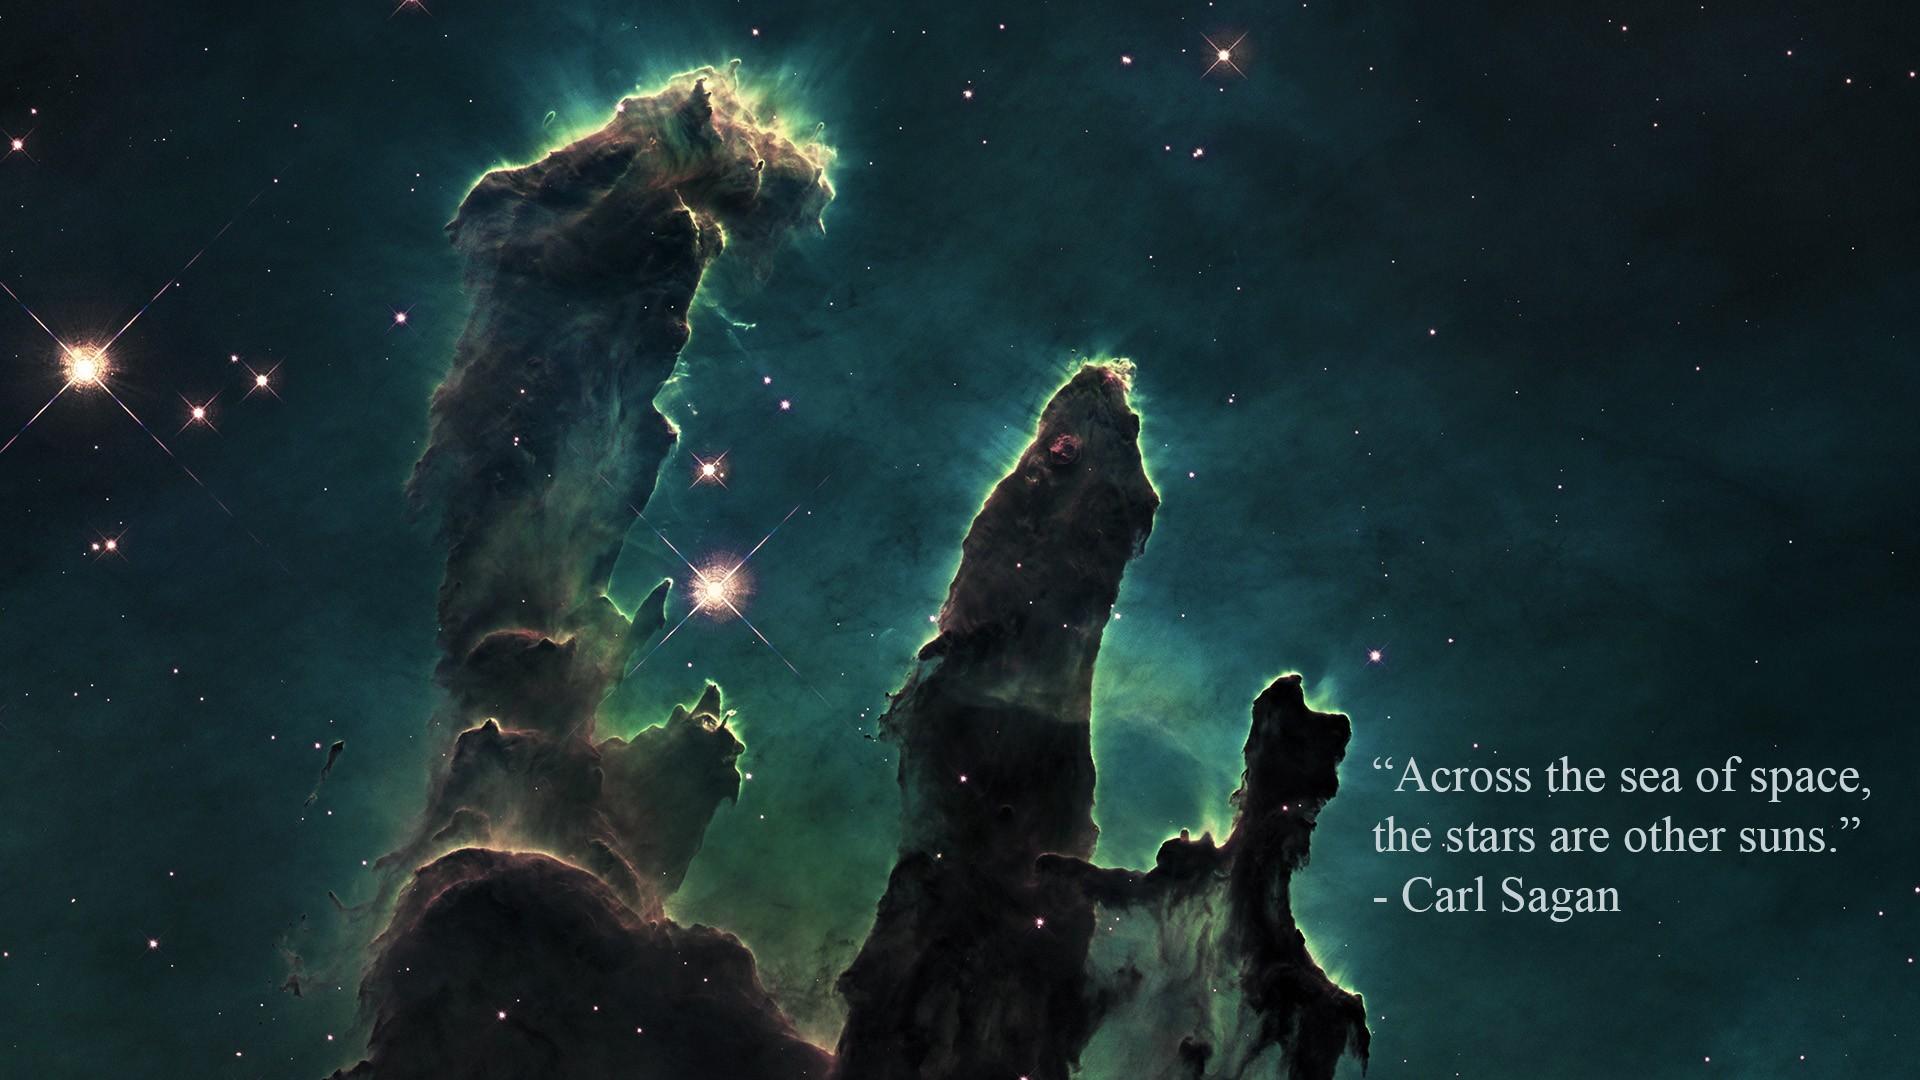 1920x1080 Px Carl Sagan Nebula Pillars Of Creation Quote Space